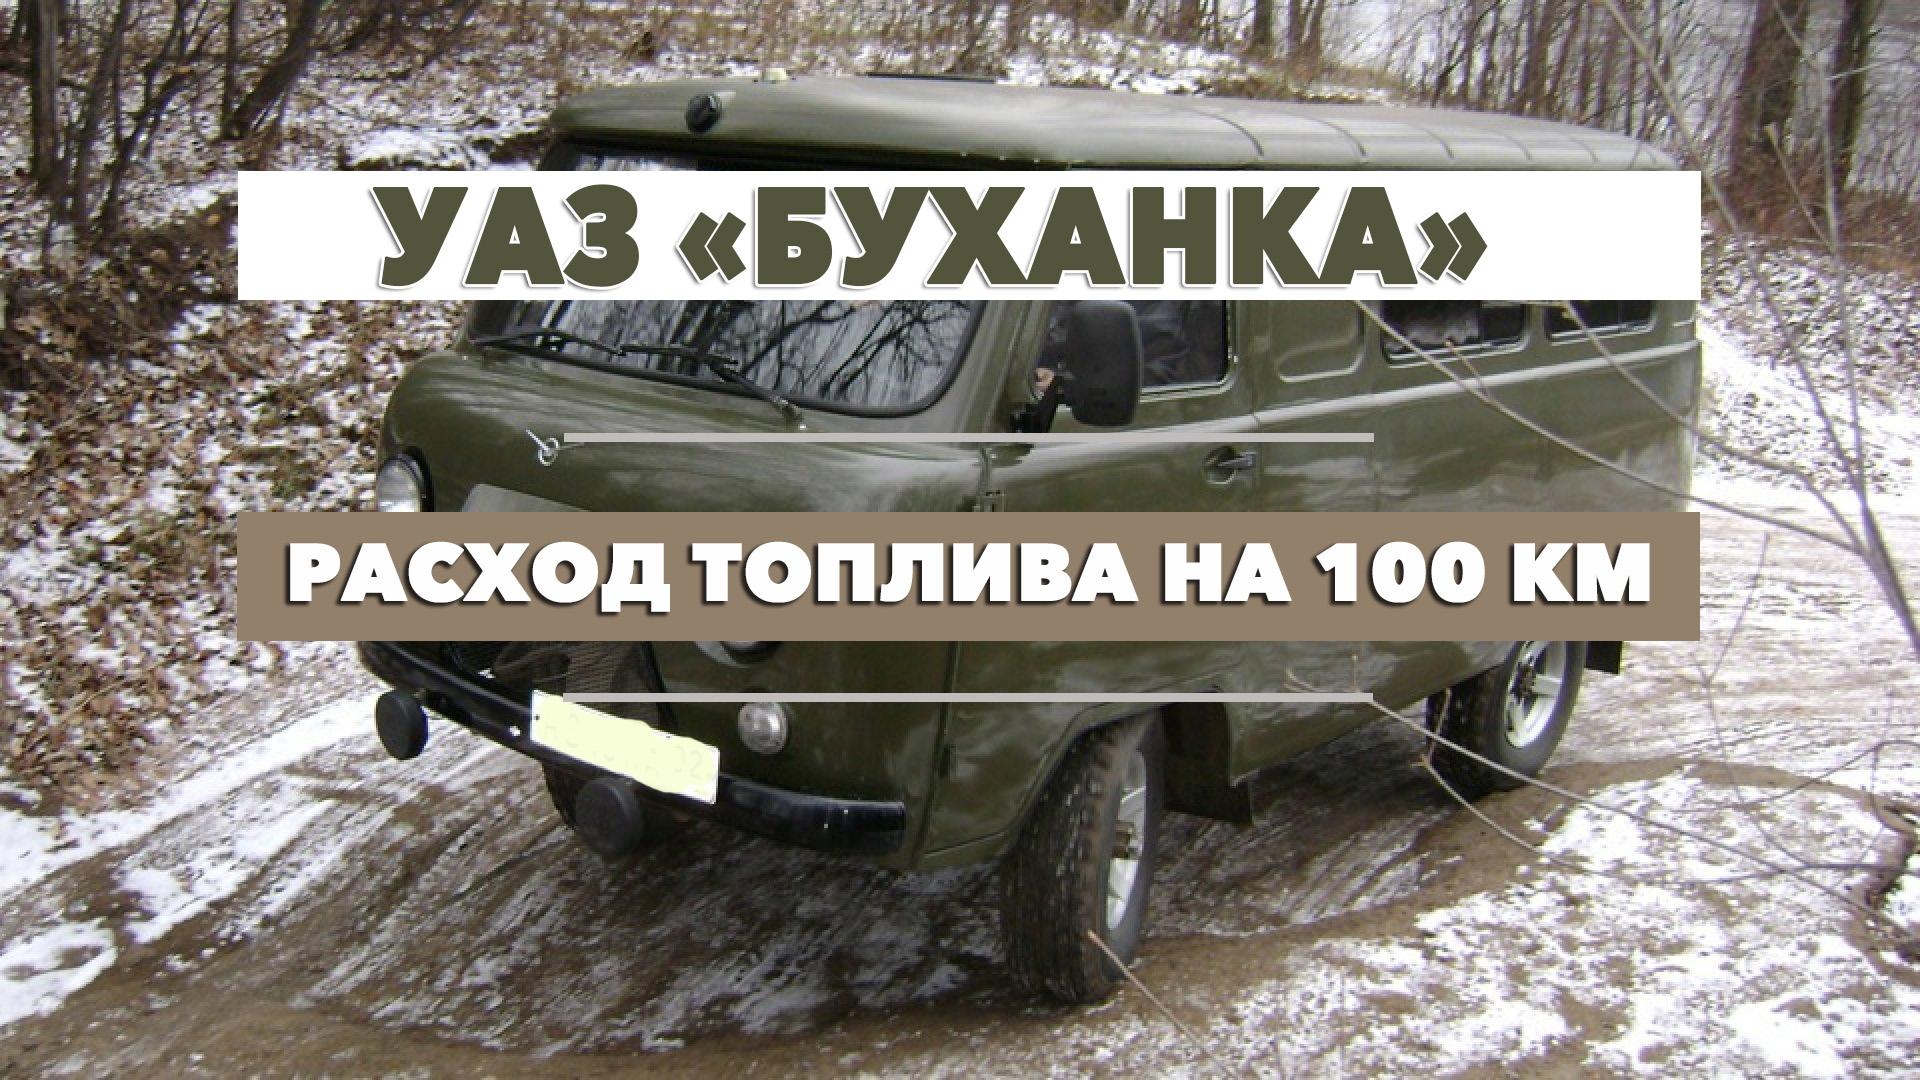 УАЗ Буханка расход топлива на 100 км